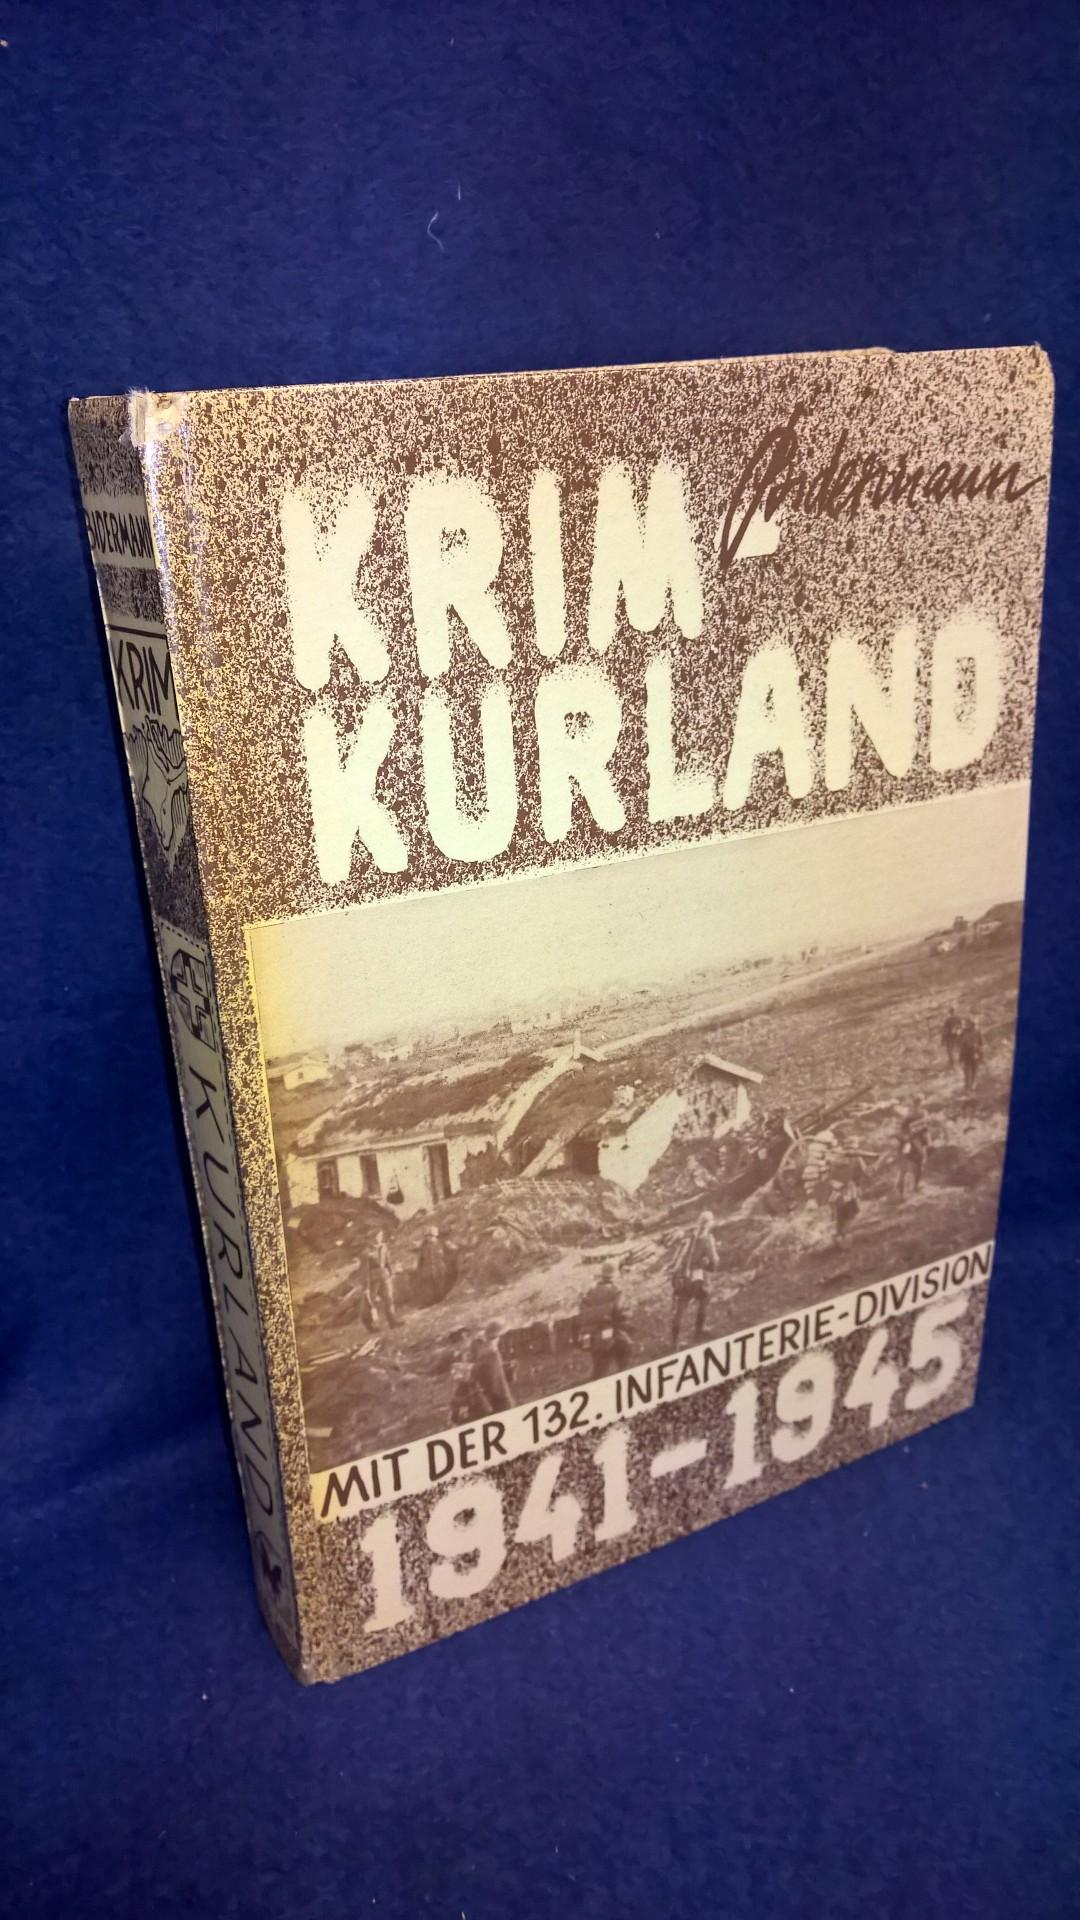 Krim - Kurland. Mit der 132. Infanterie-Division 1941 - 1945.